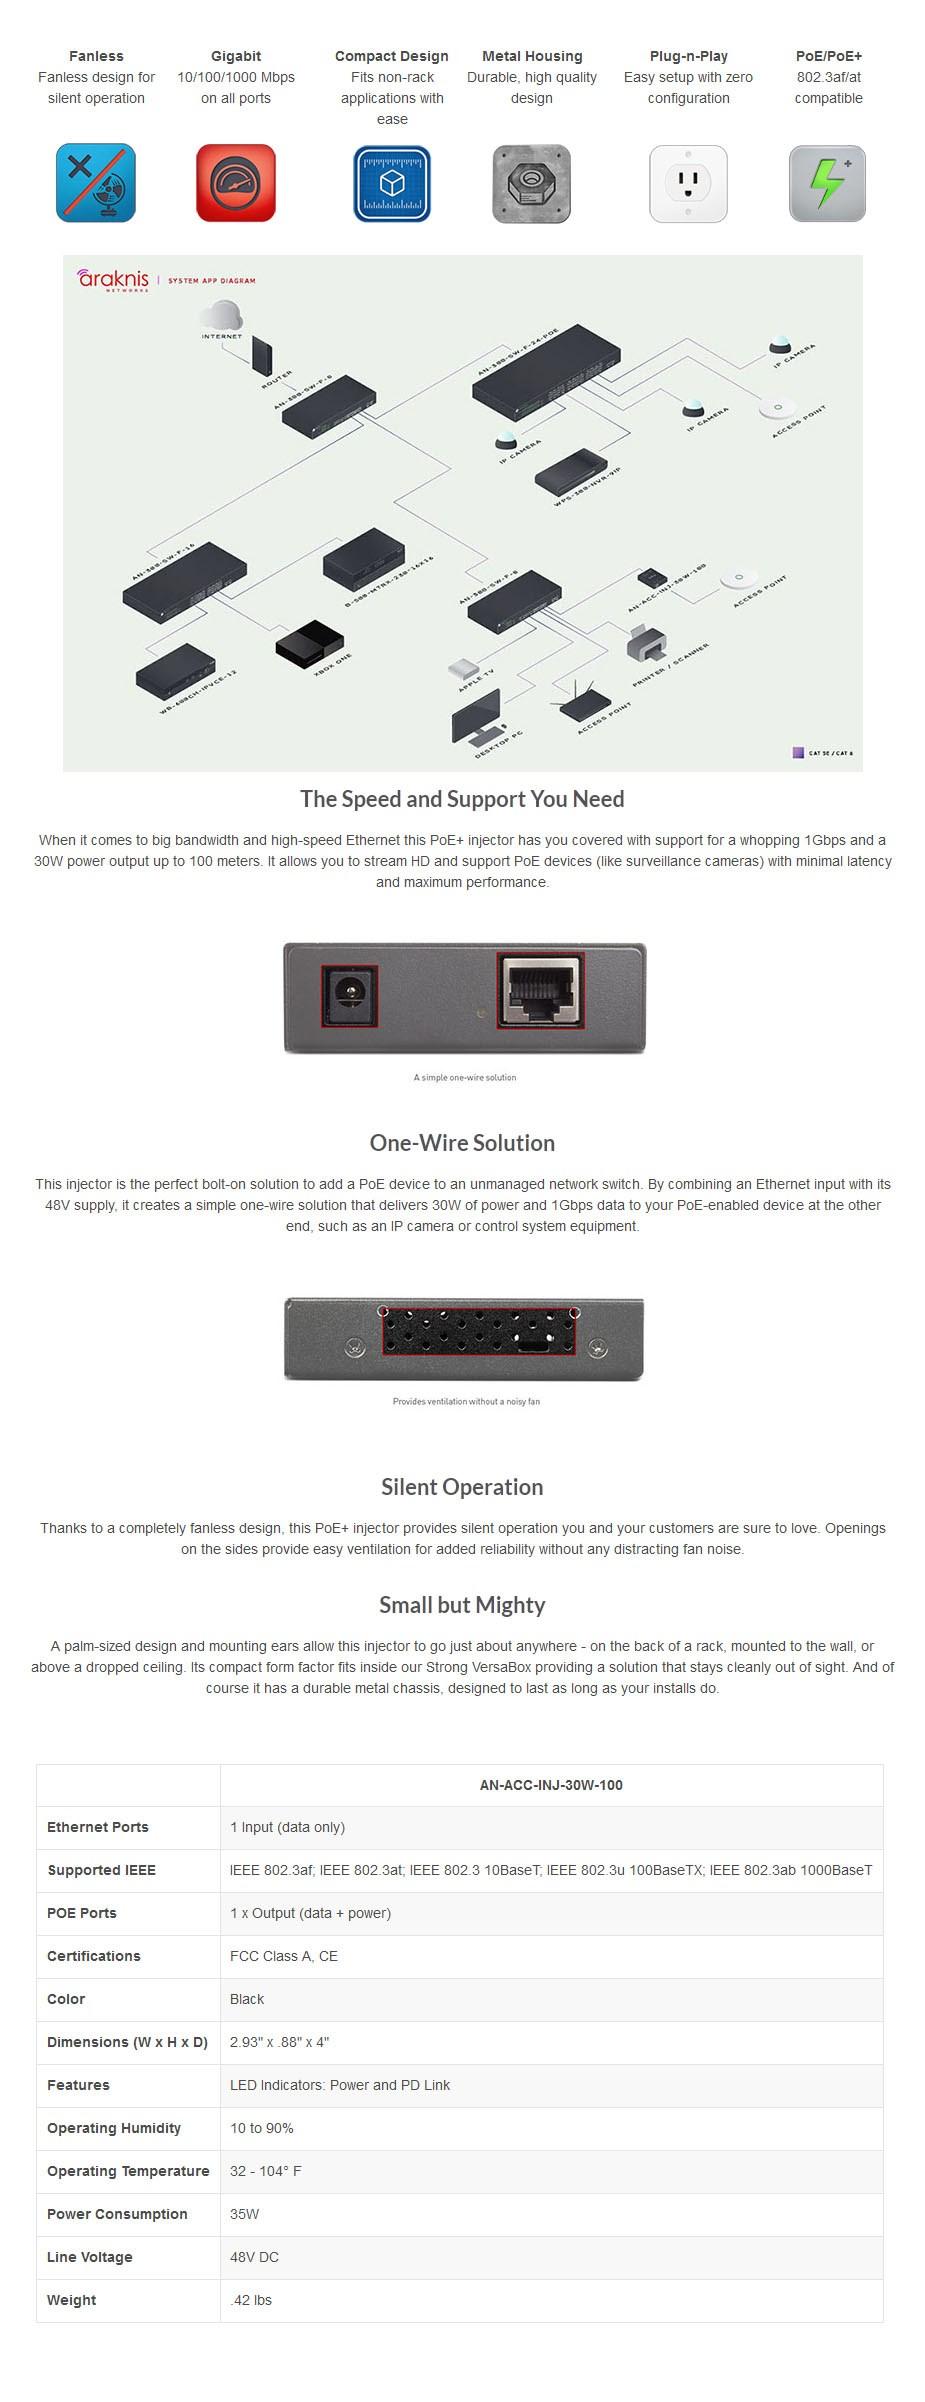 Araknis Networks AN-ACC-INJ-30W-100 Gigabit PoE+ Injector - Overview 1